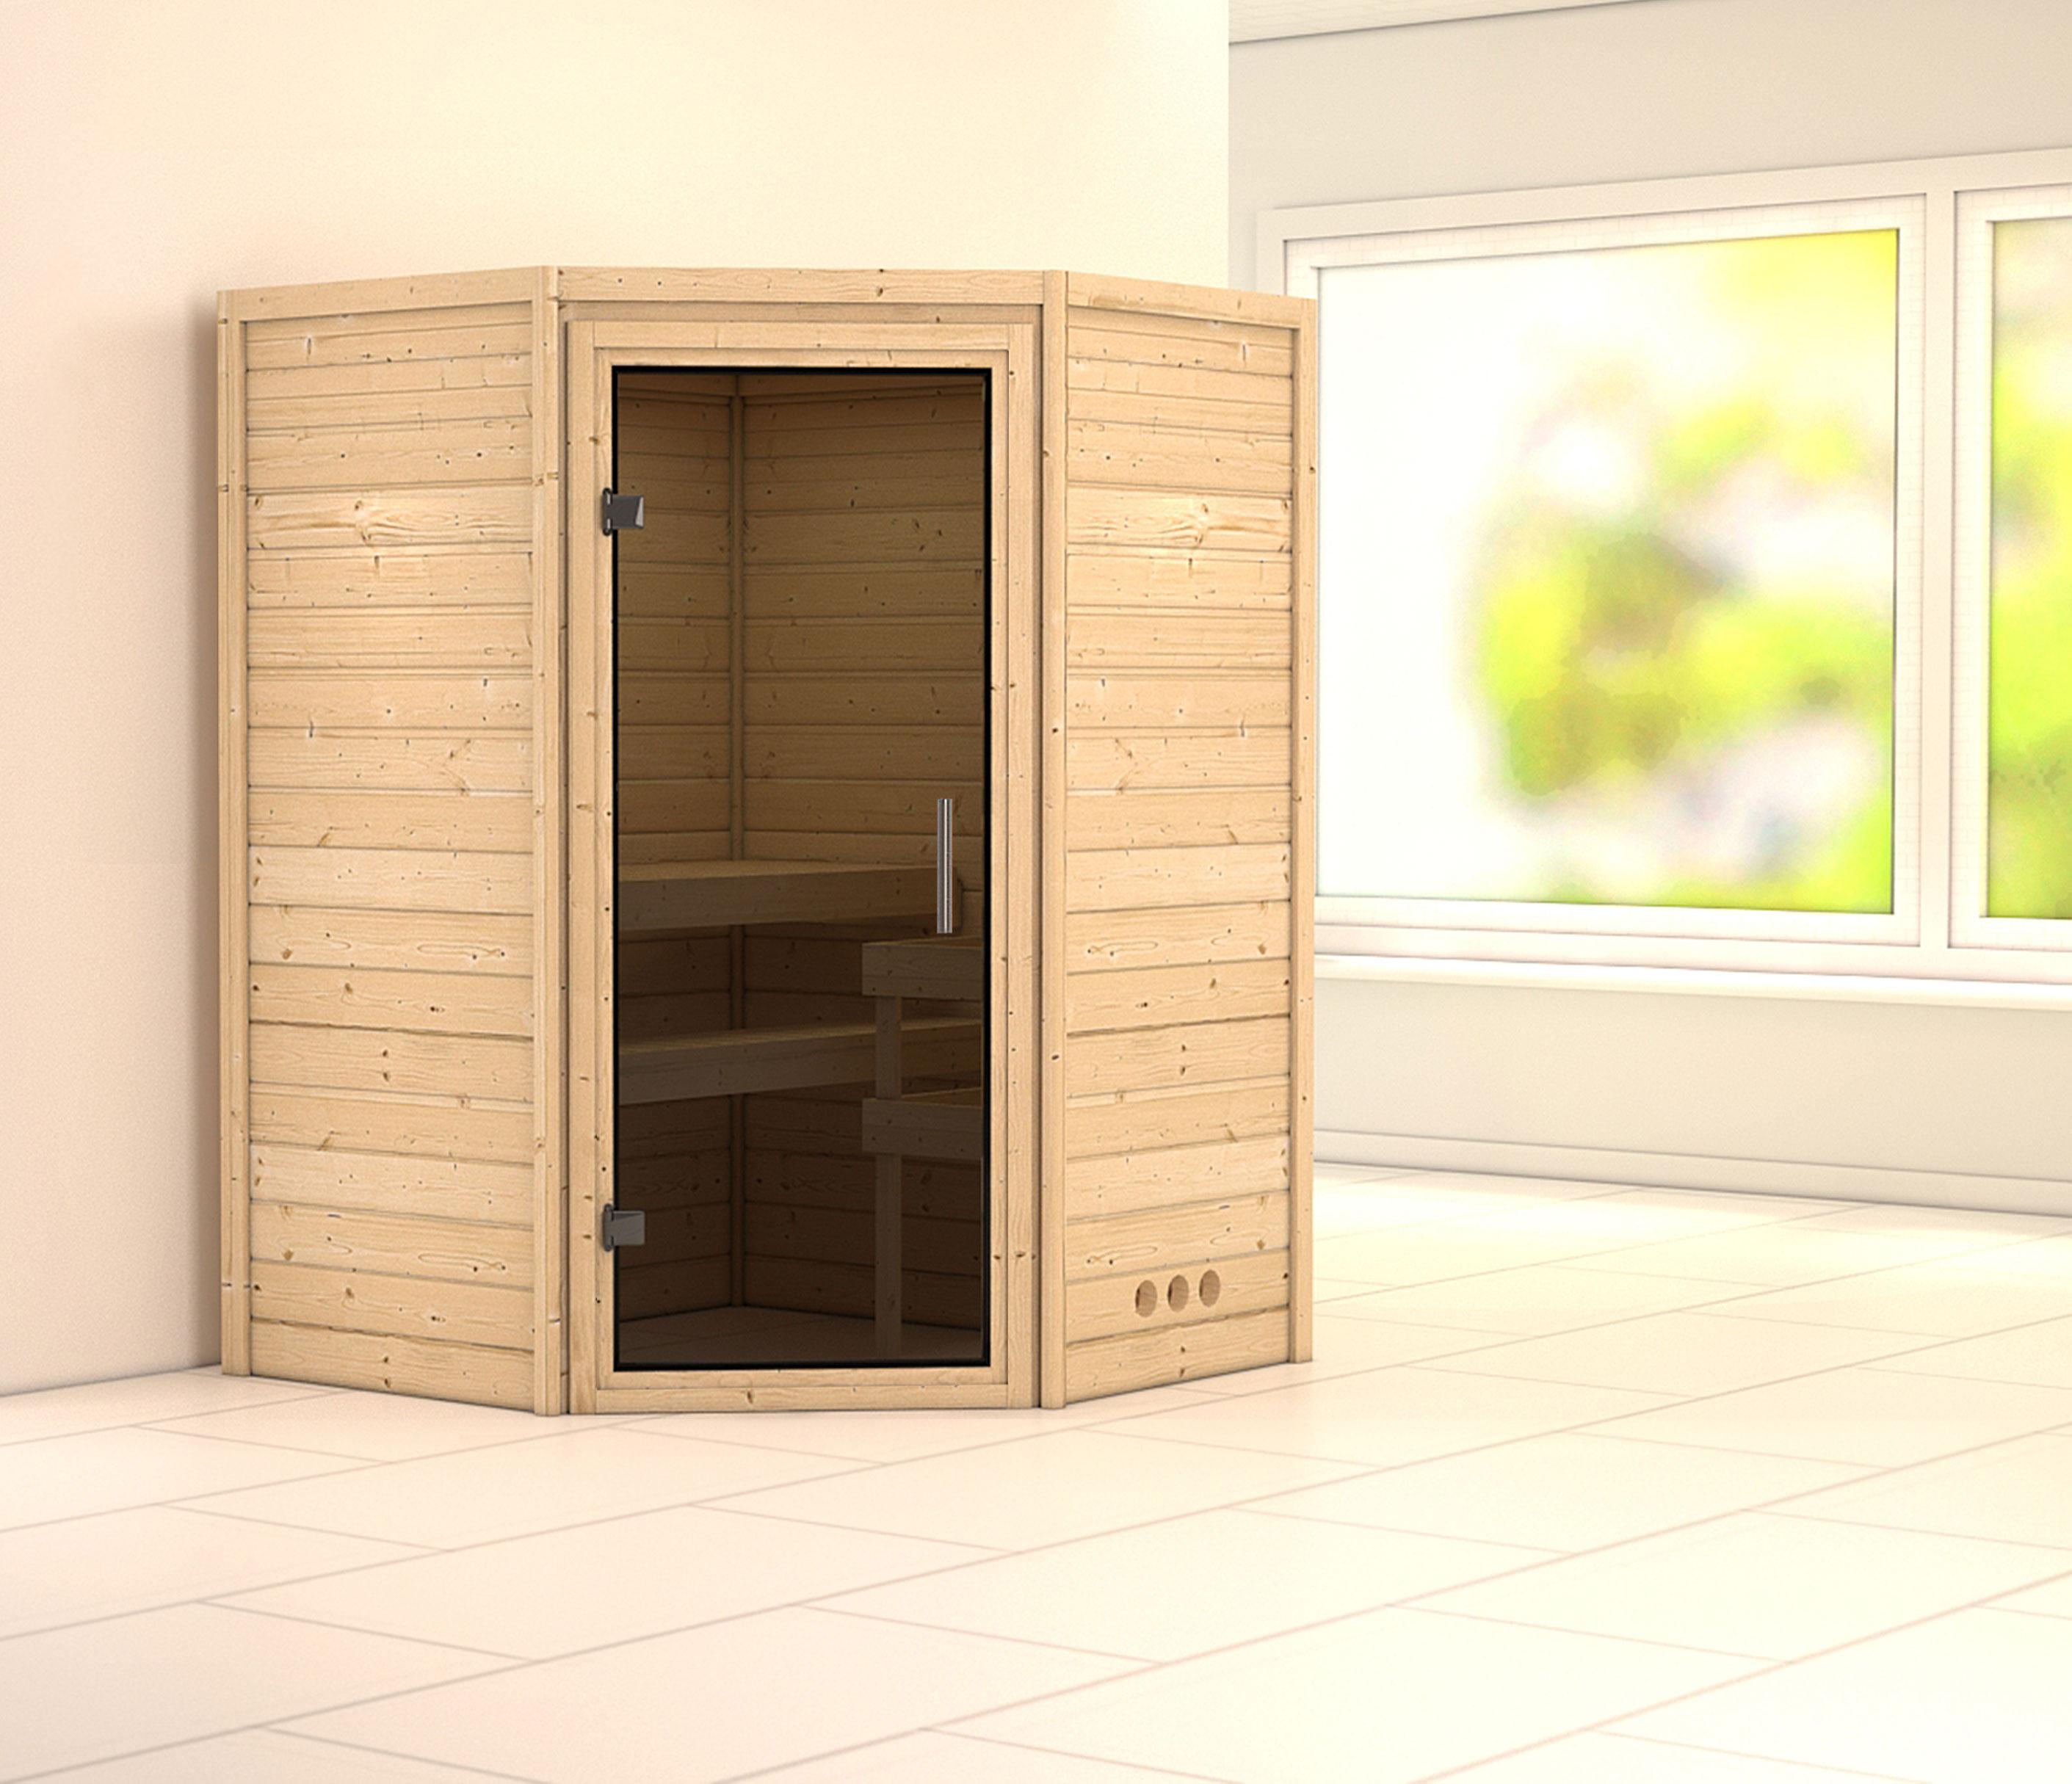 Woodfeeling Sauna Franka 38mm 230V ohne Ofen moderne Tür Bild 1